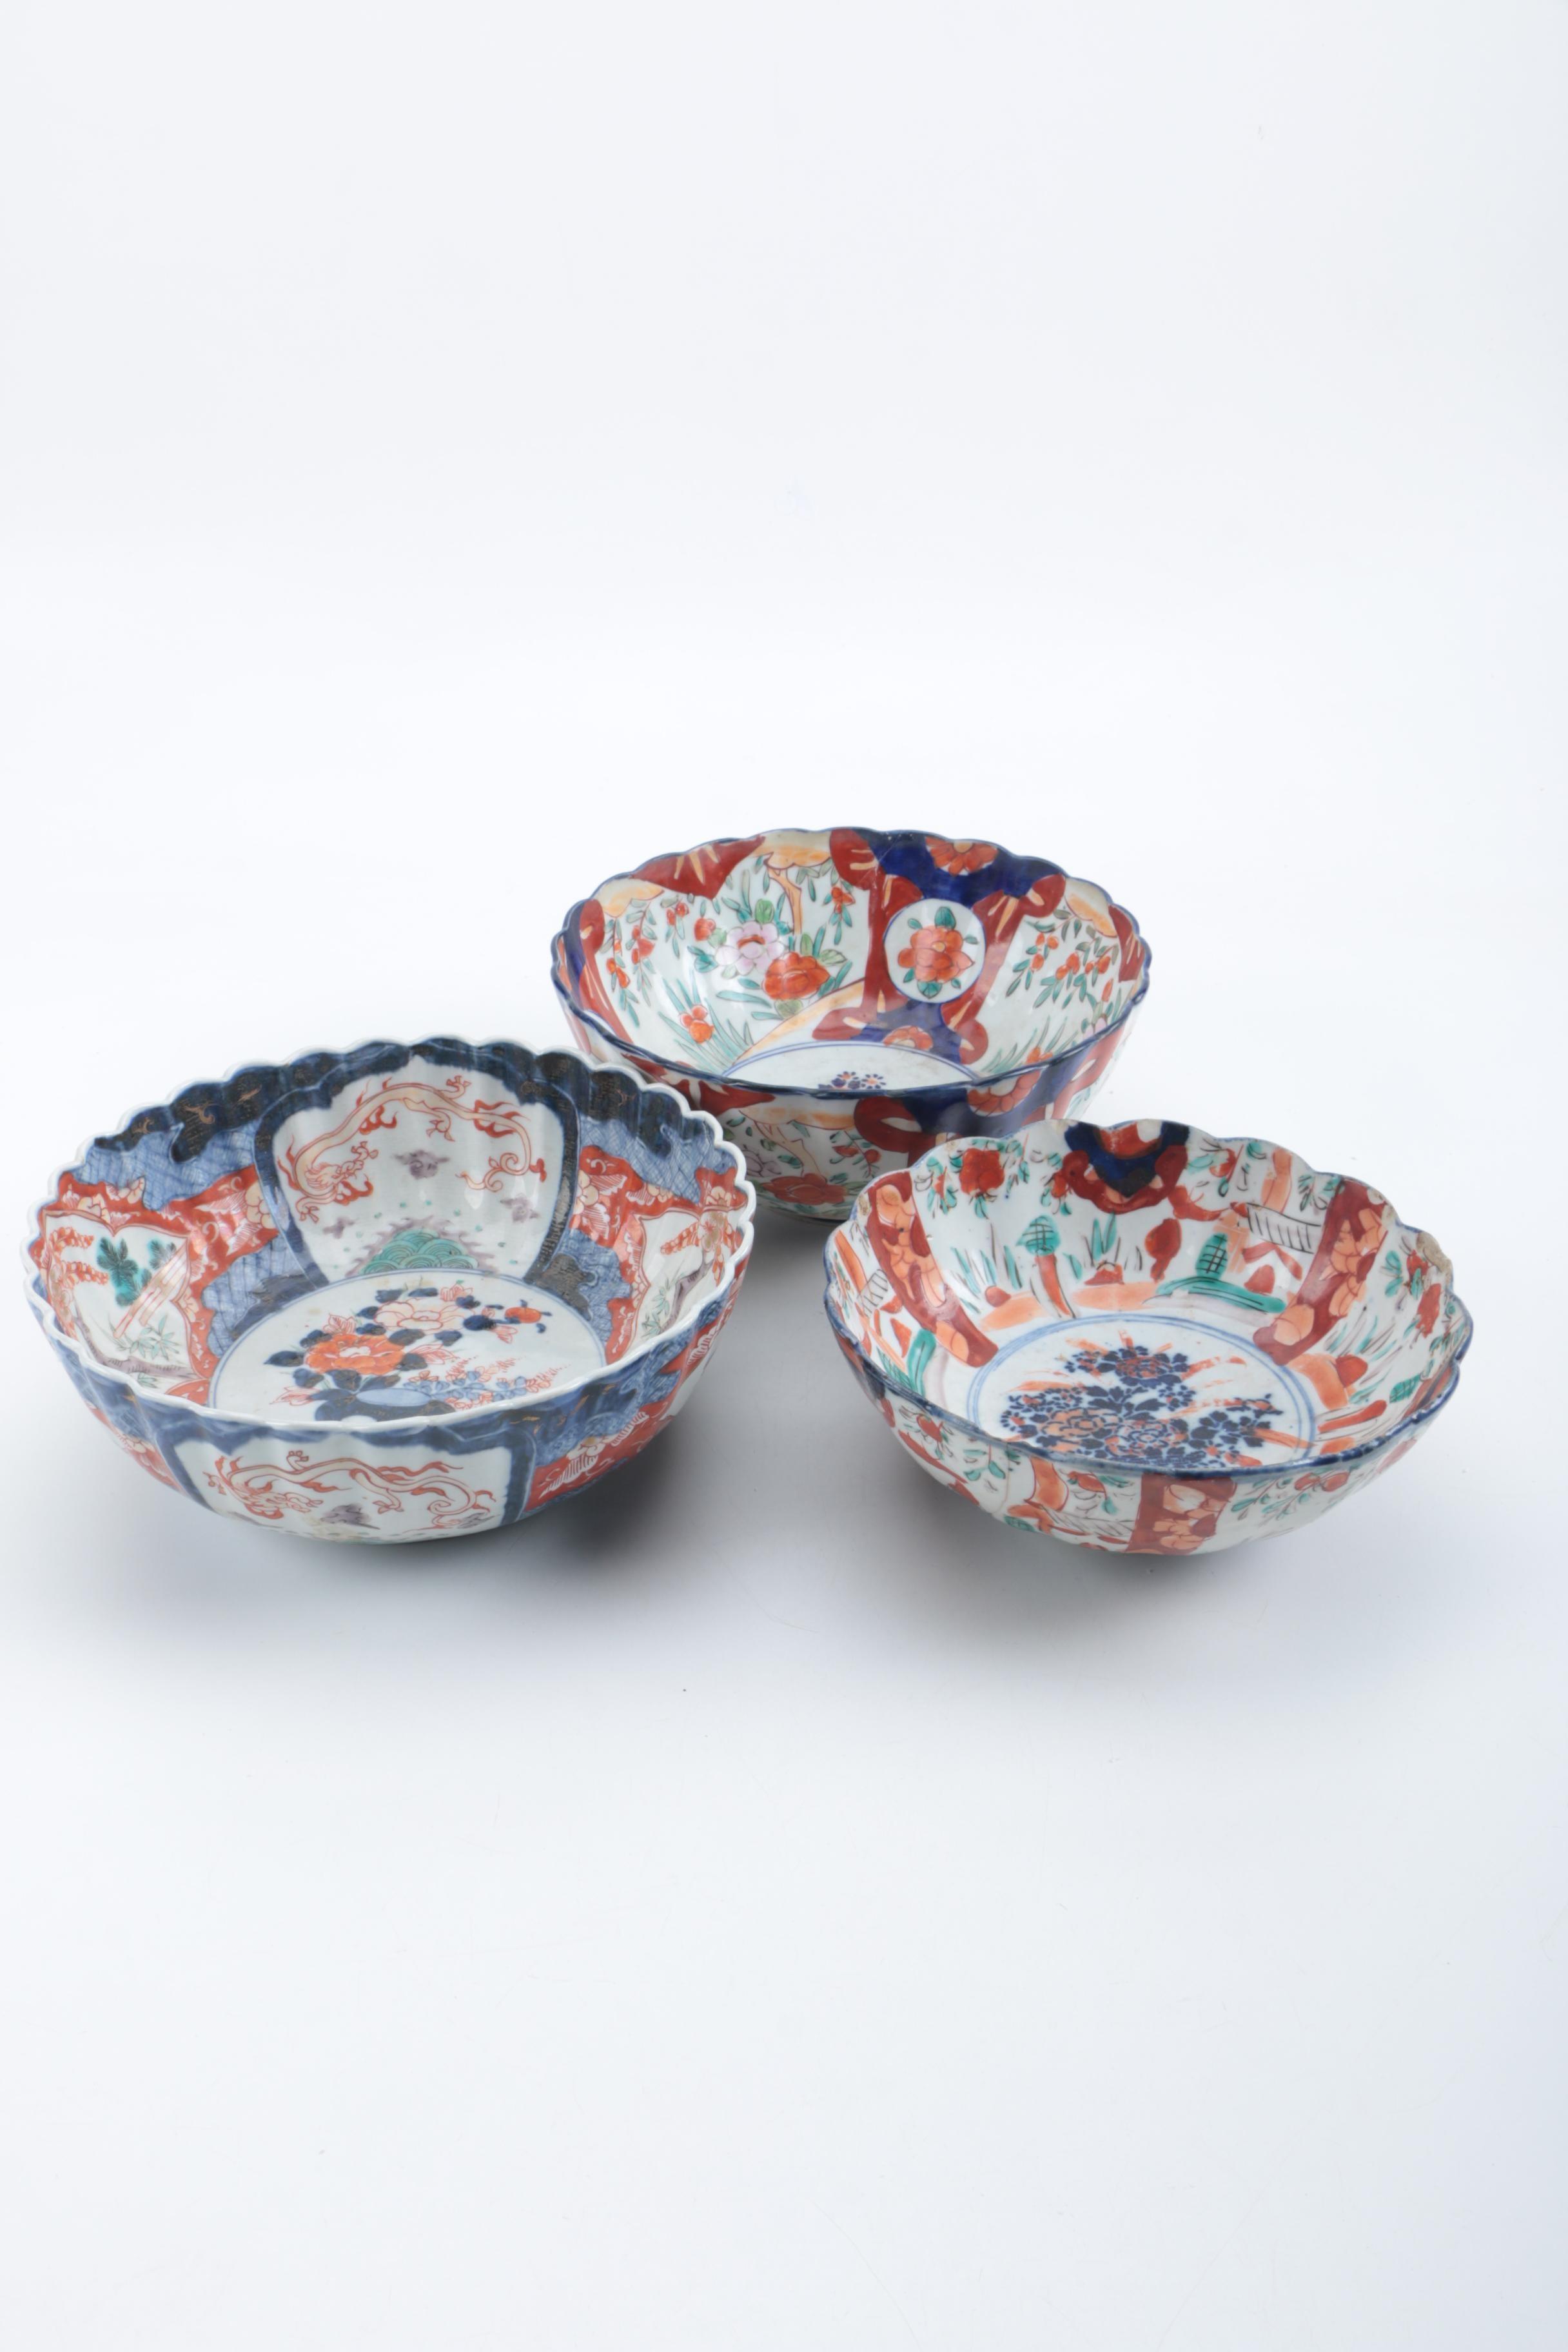 Antique and Vintage Japanese Imari Bowls